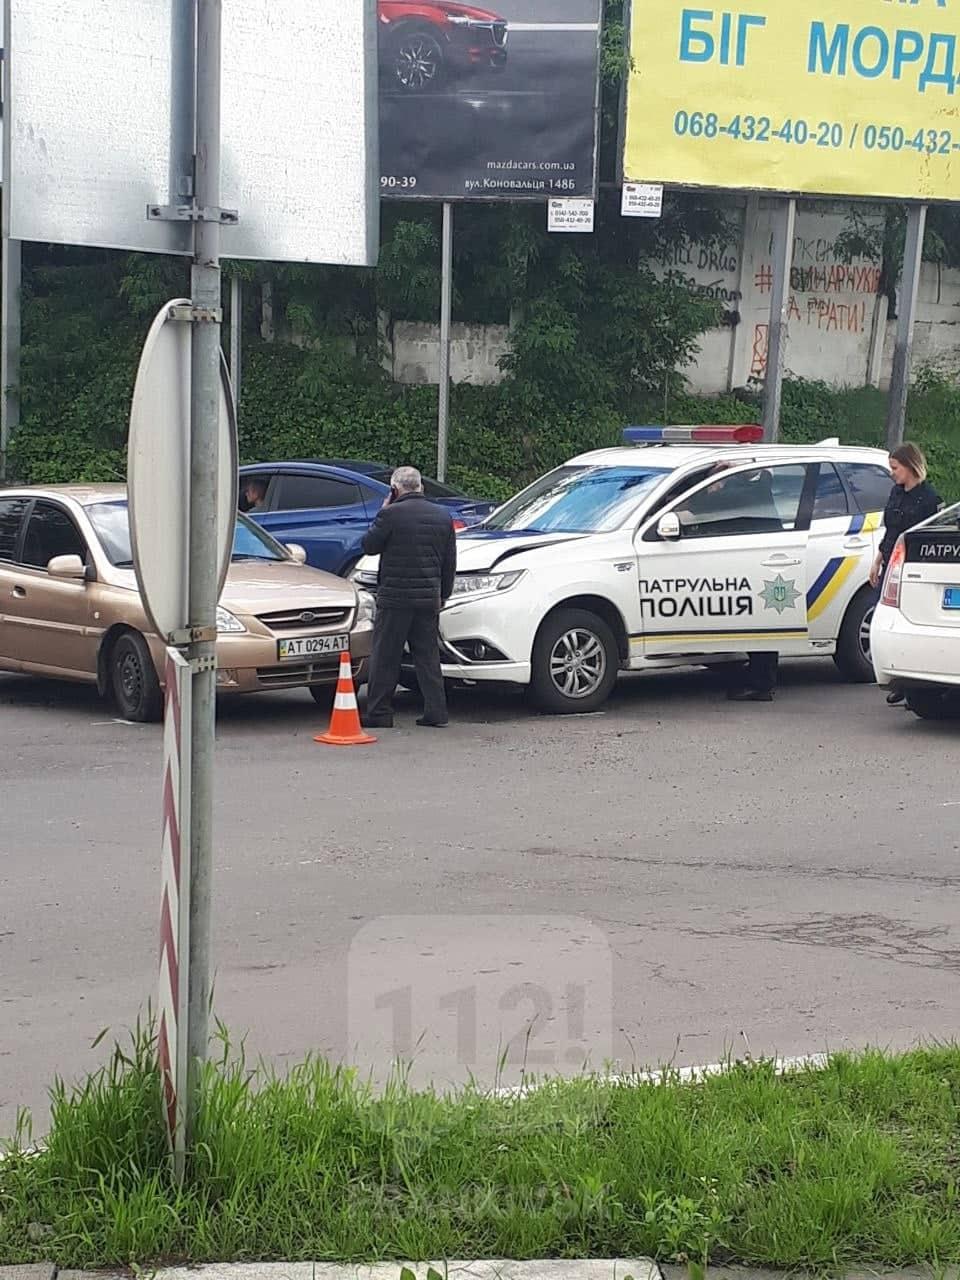 Патрульні на новенькому Mitsubishi потрапили в ДТП (фотофакт)